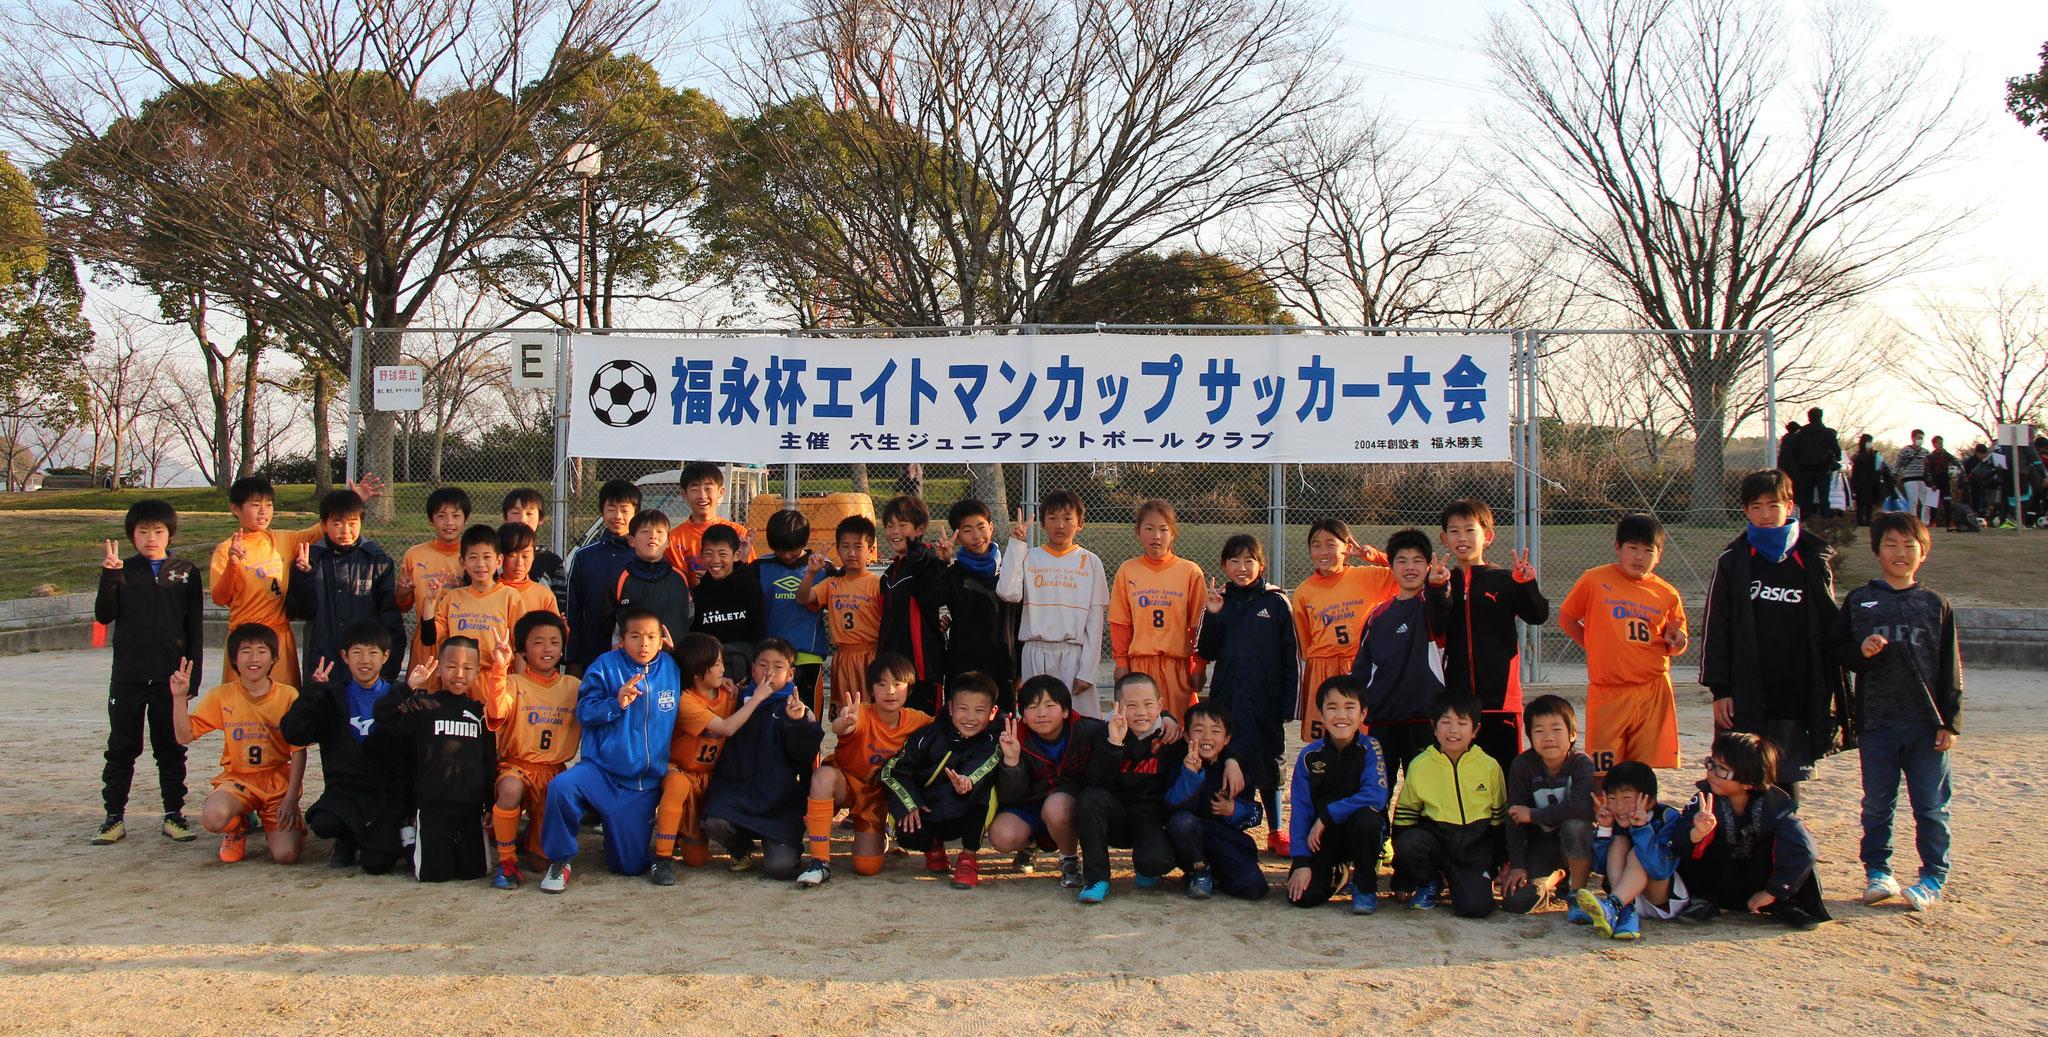 U-12福永杯 ベストグループ6位 2019/2/24